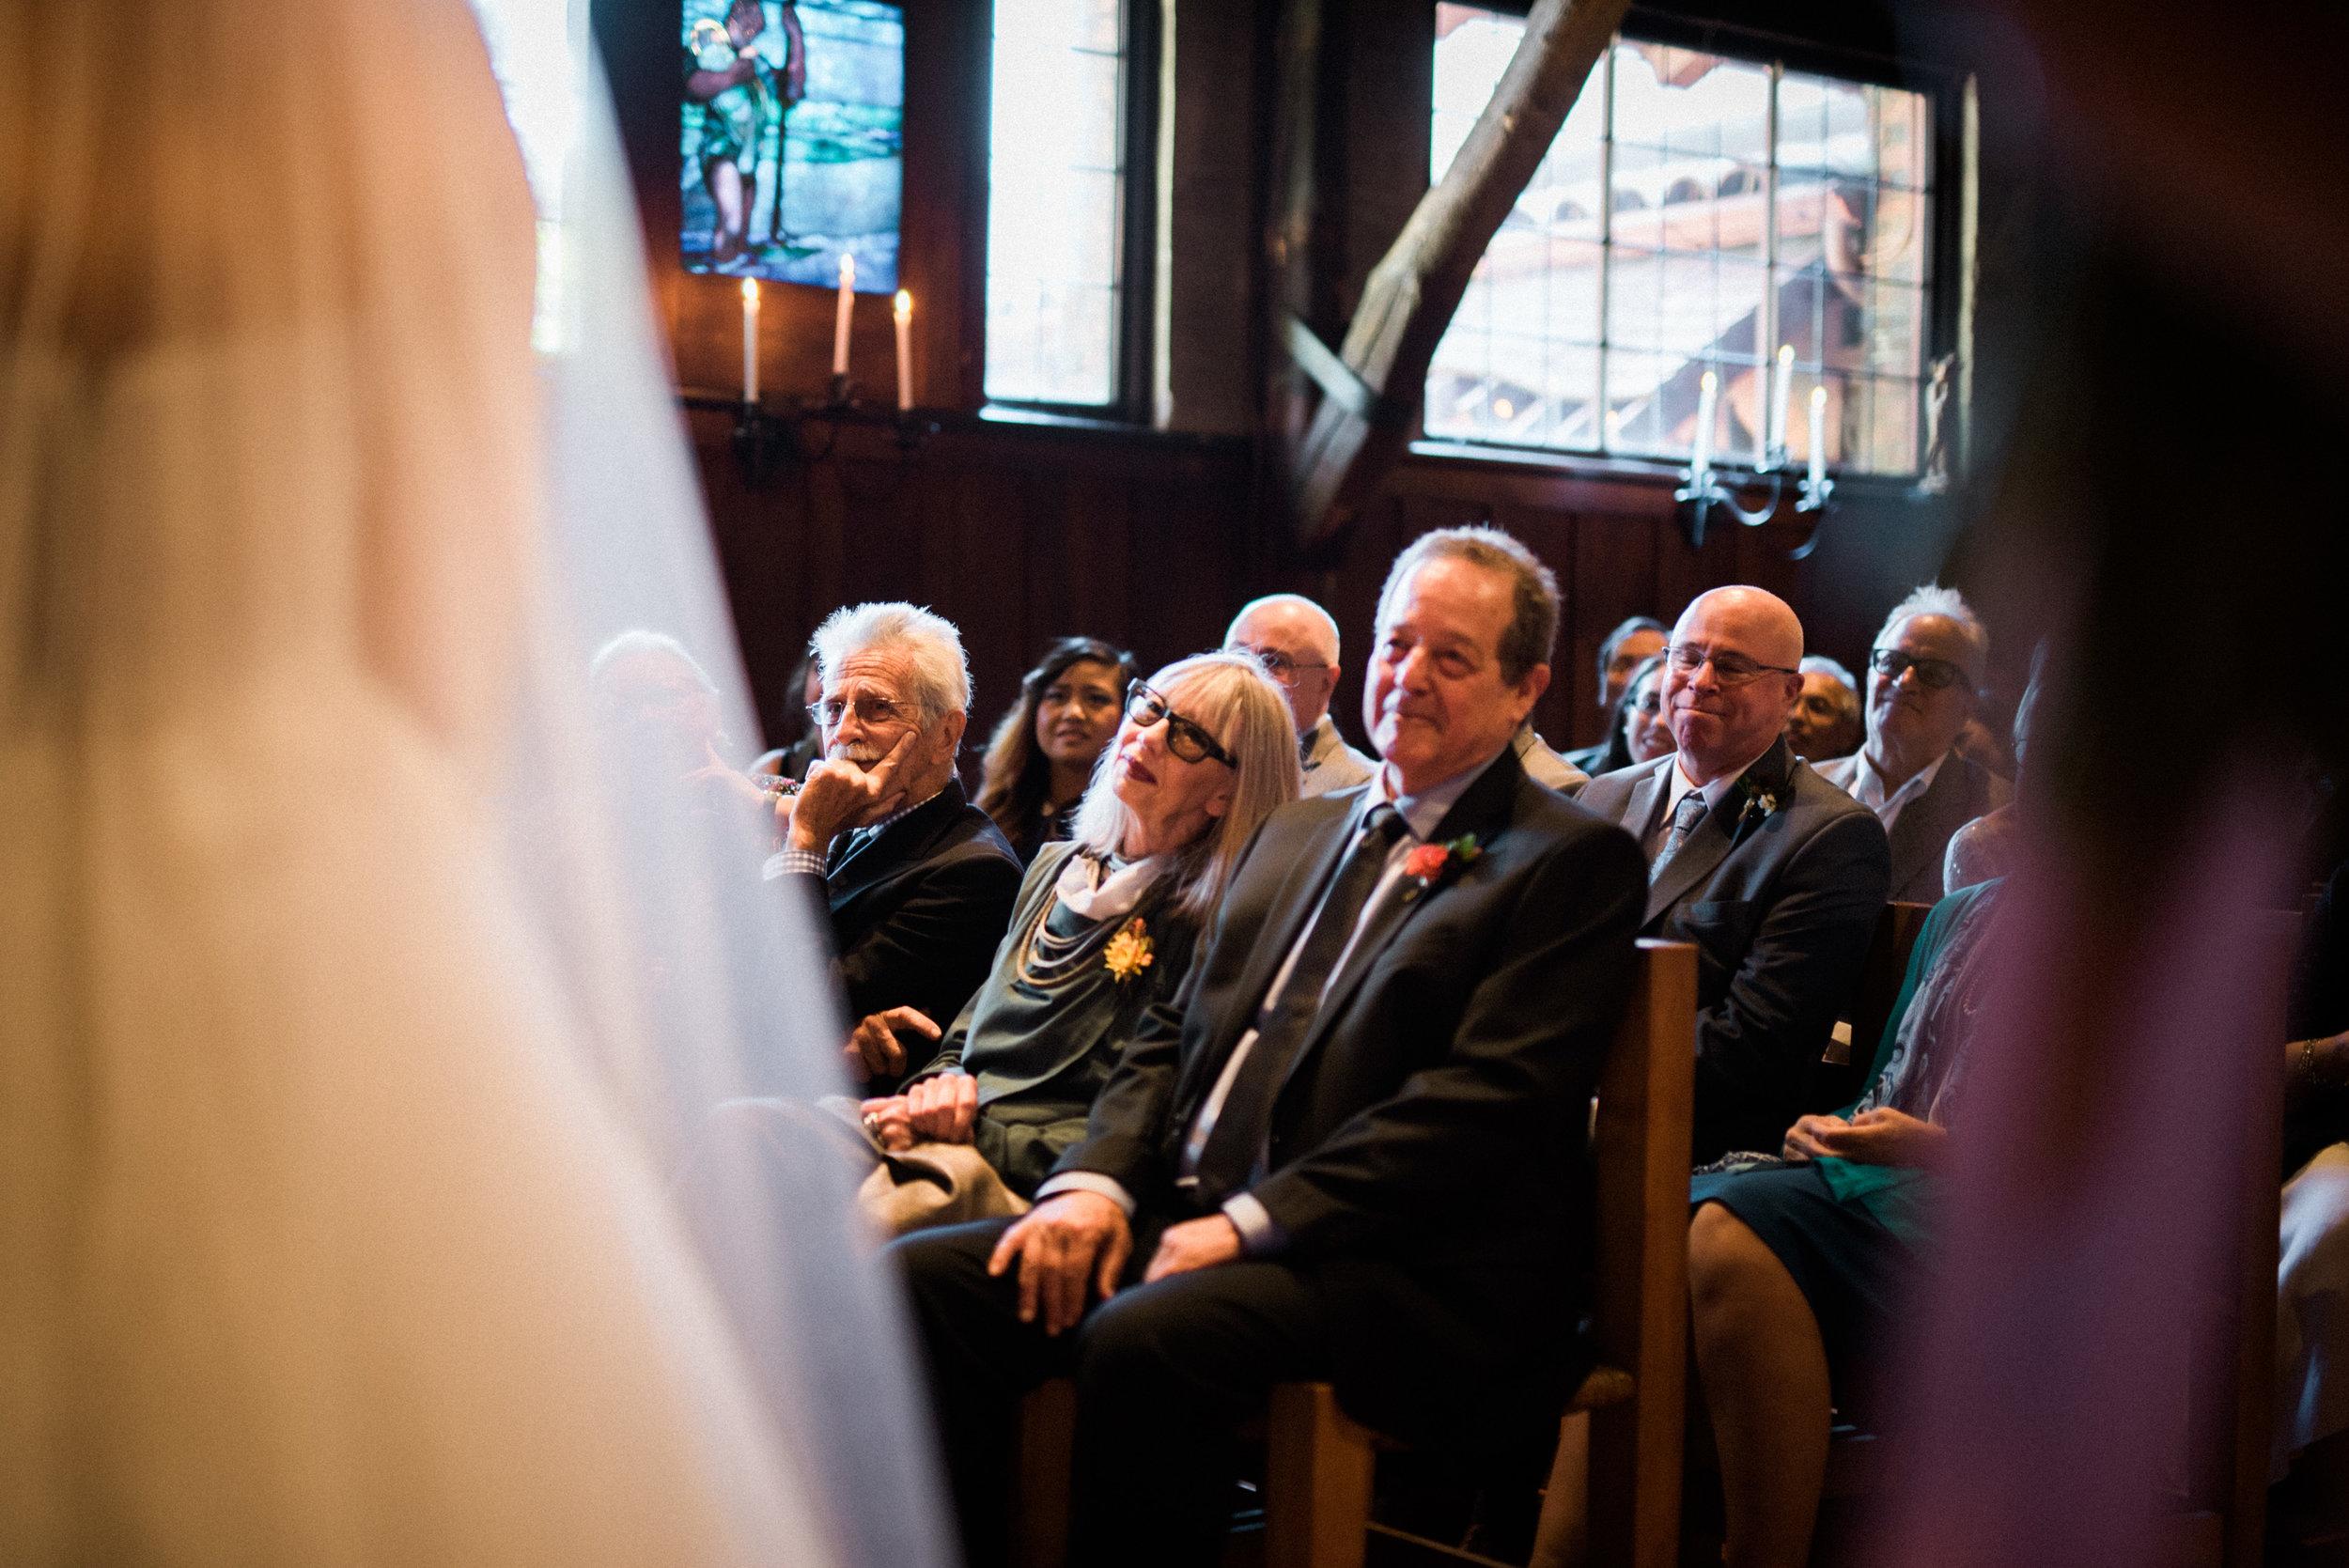 Swedenborgian Church Dogpatch Winery Wedding026.jpg